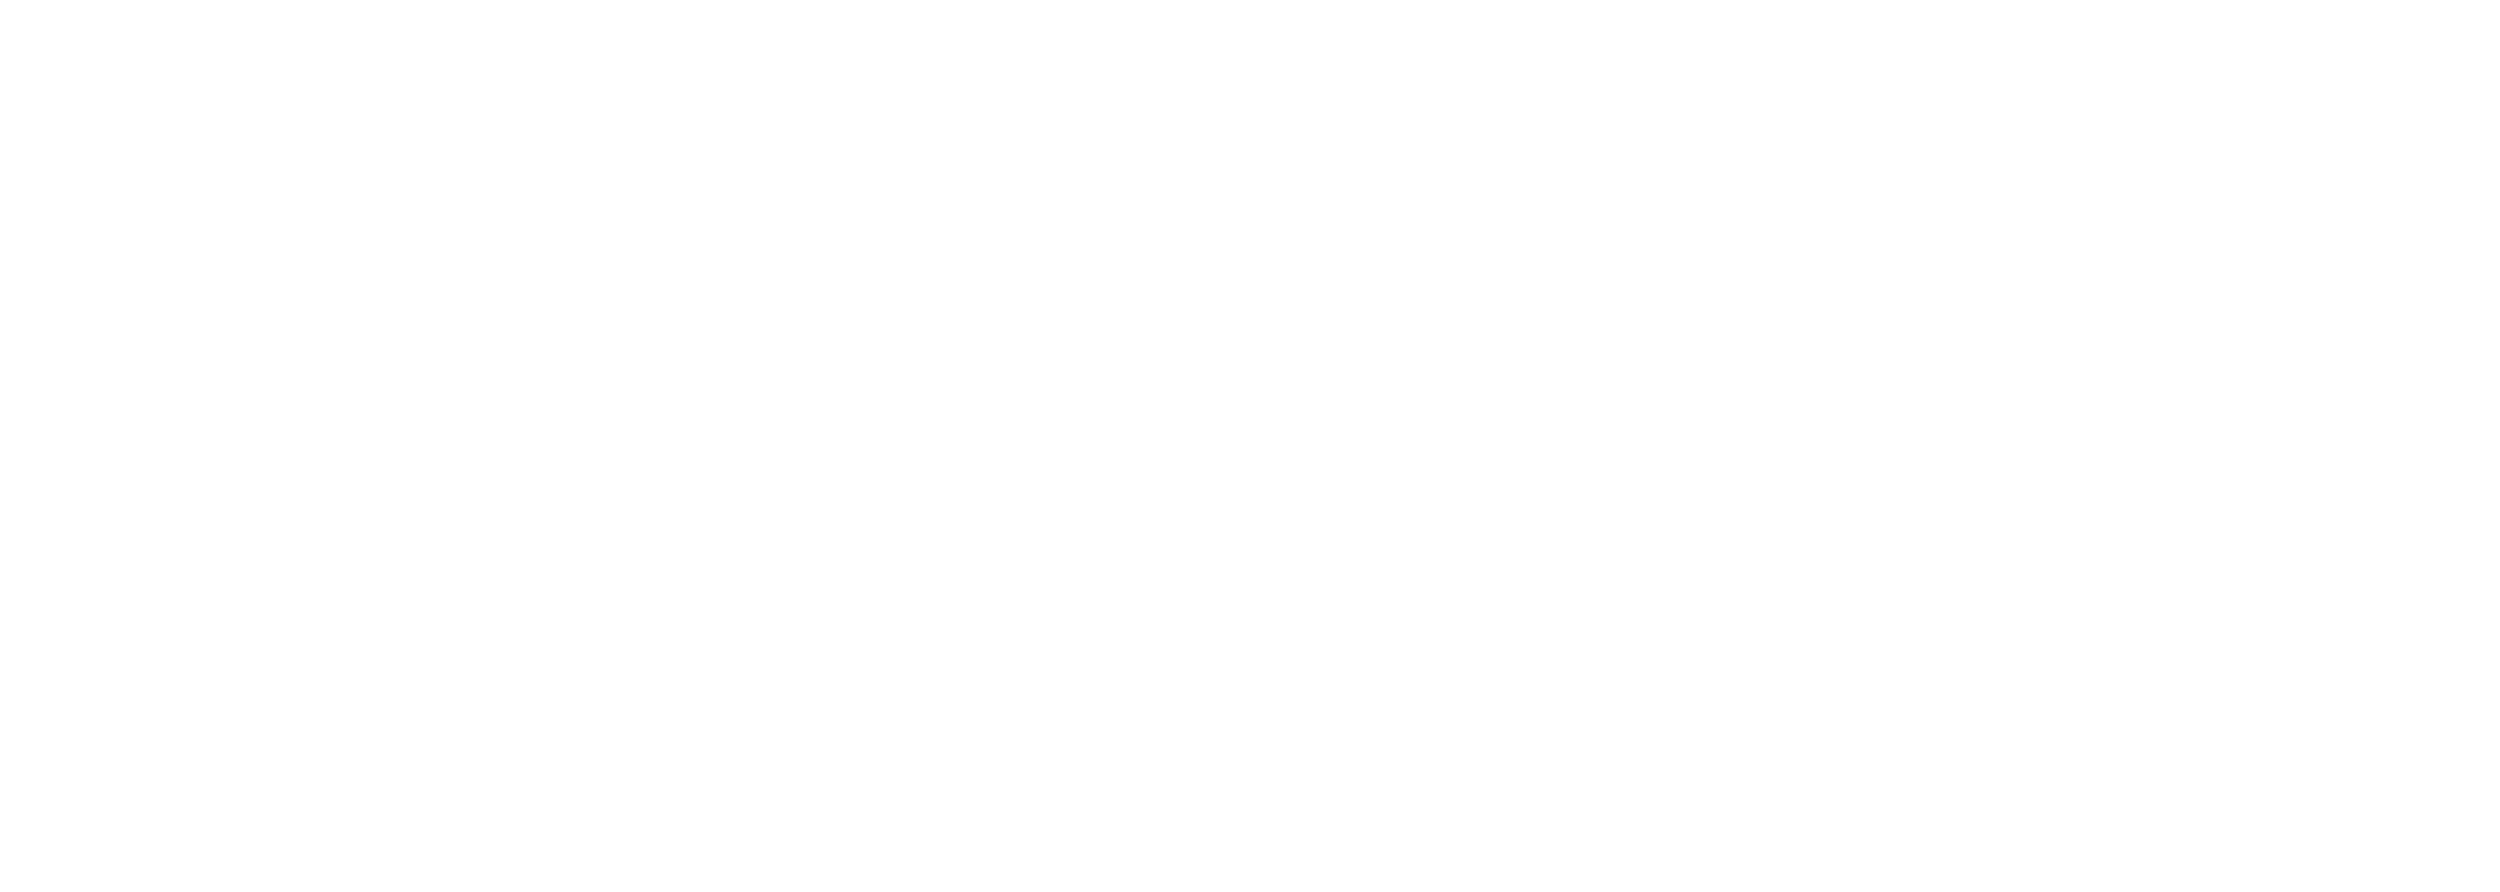 PodcastMovement_FullLogo_Color_RGB.png